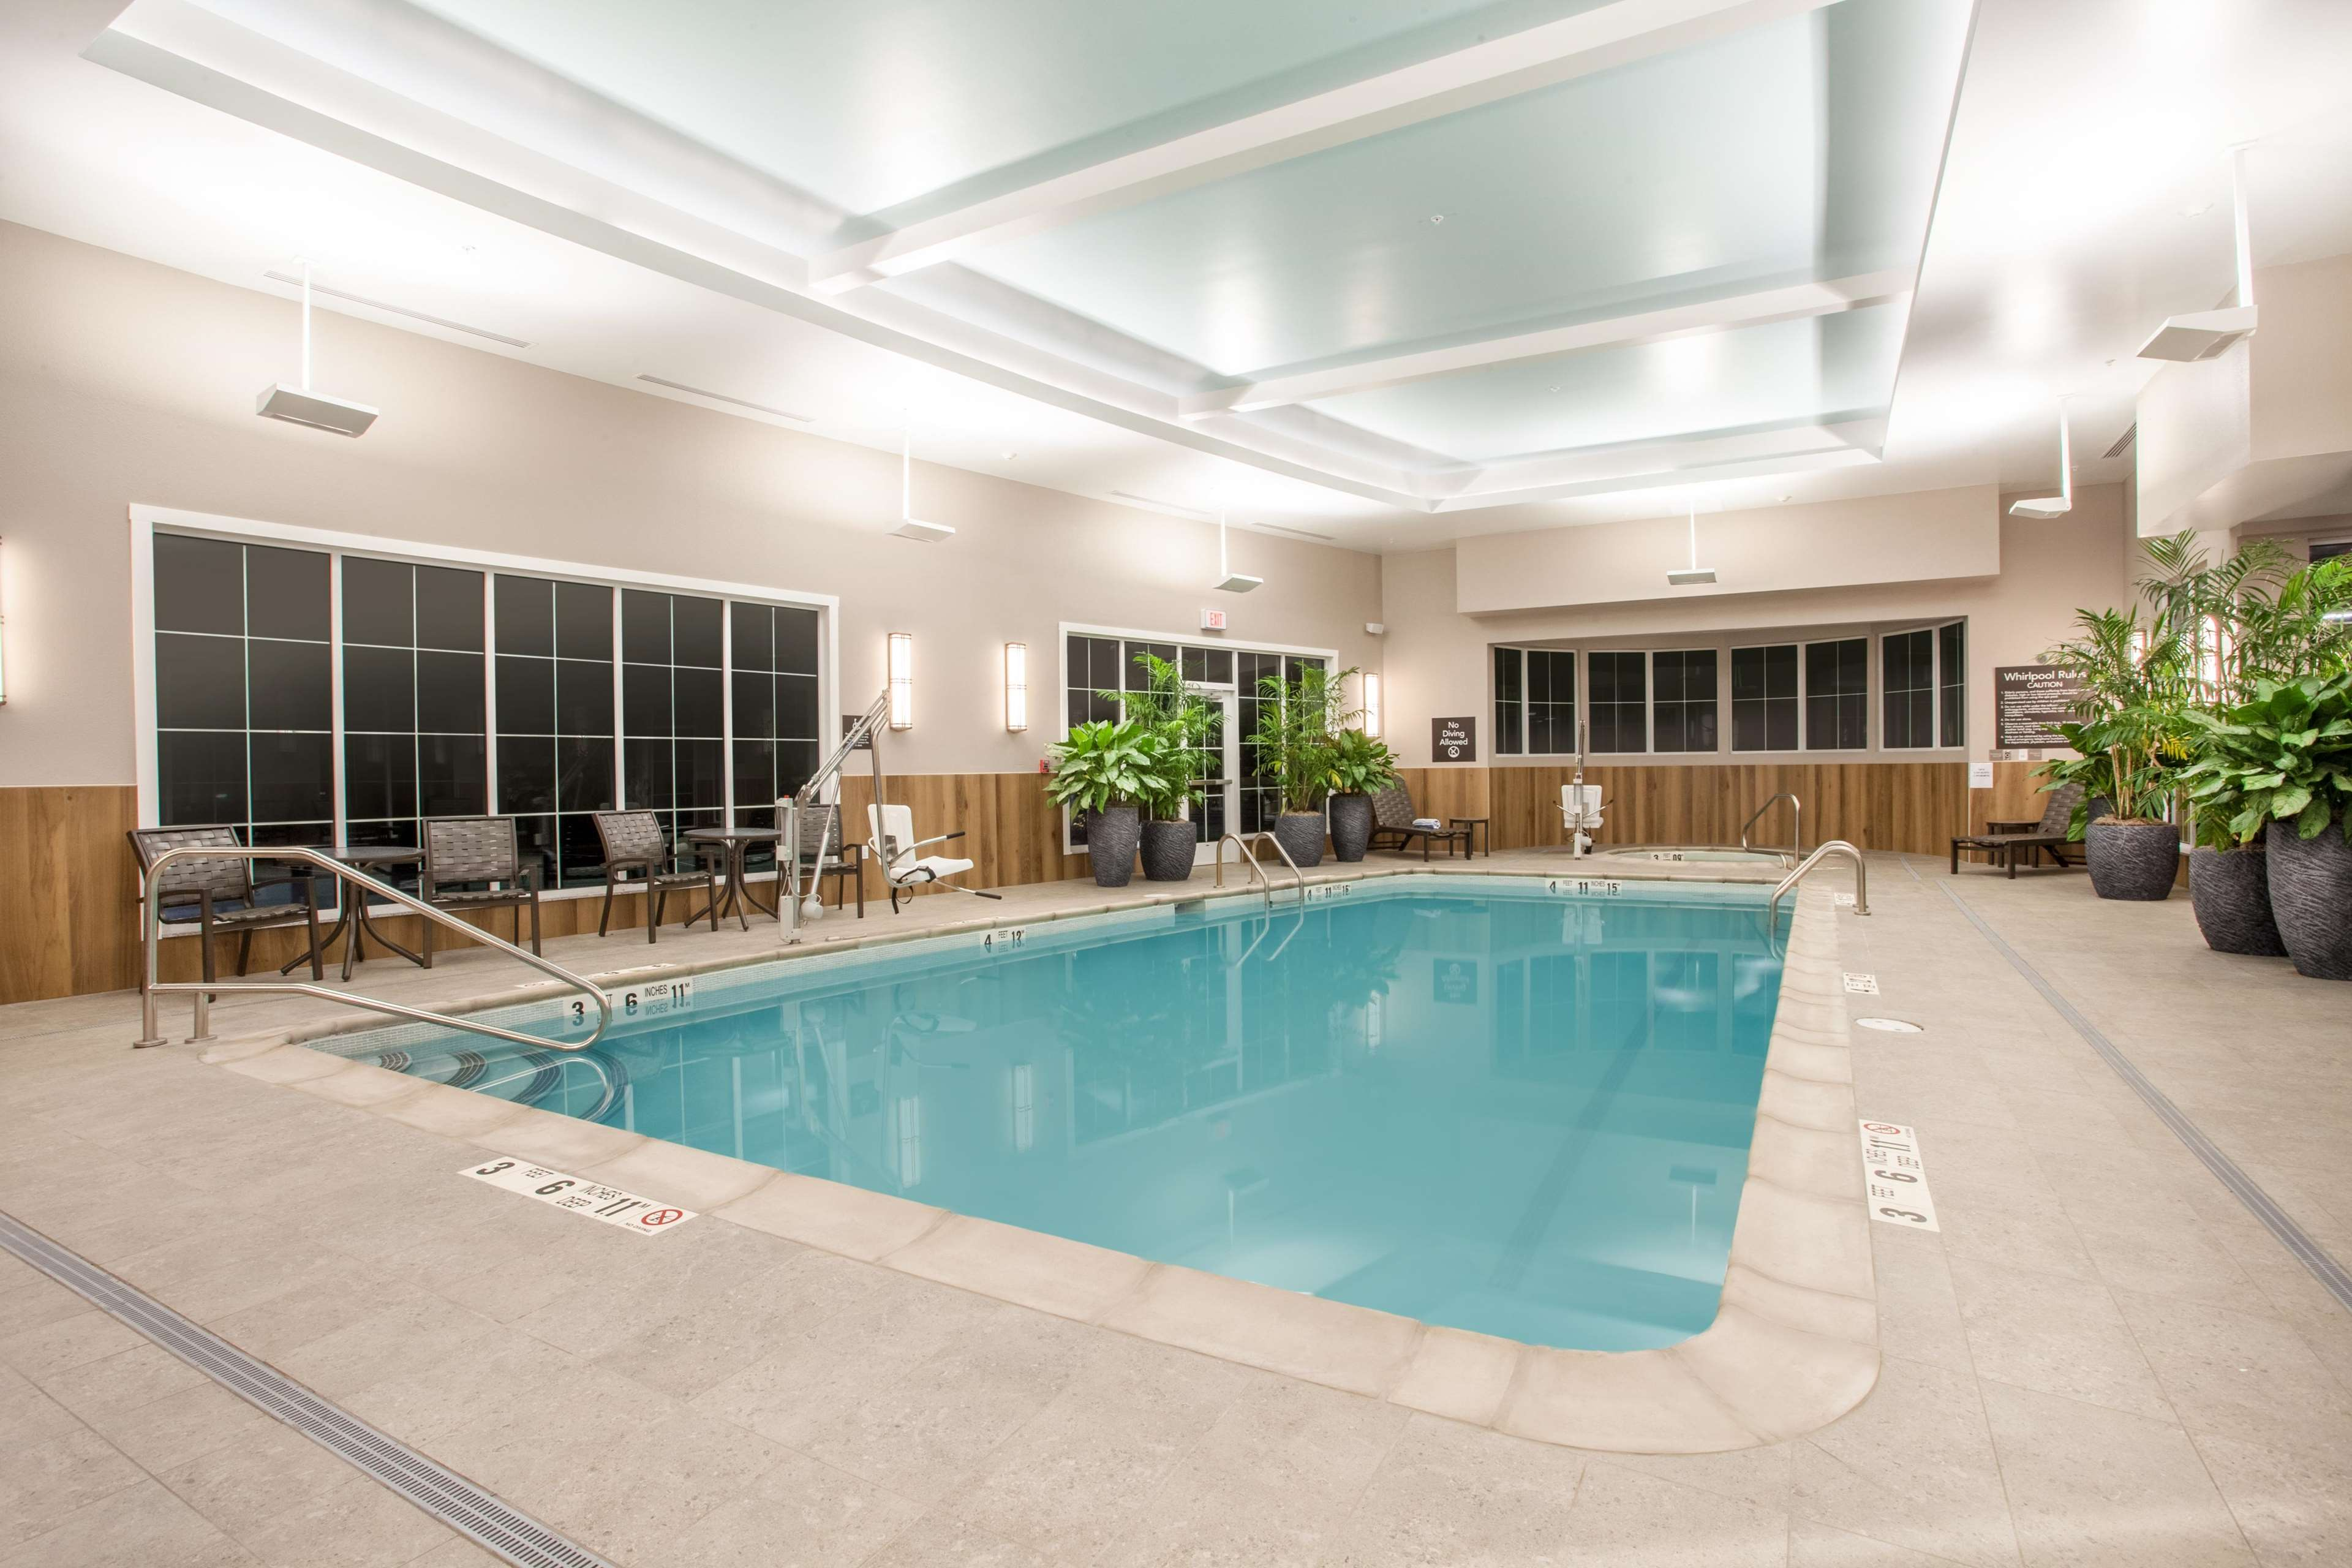 Homewood Suites by Hilton Saratoga Springs image 41